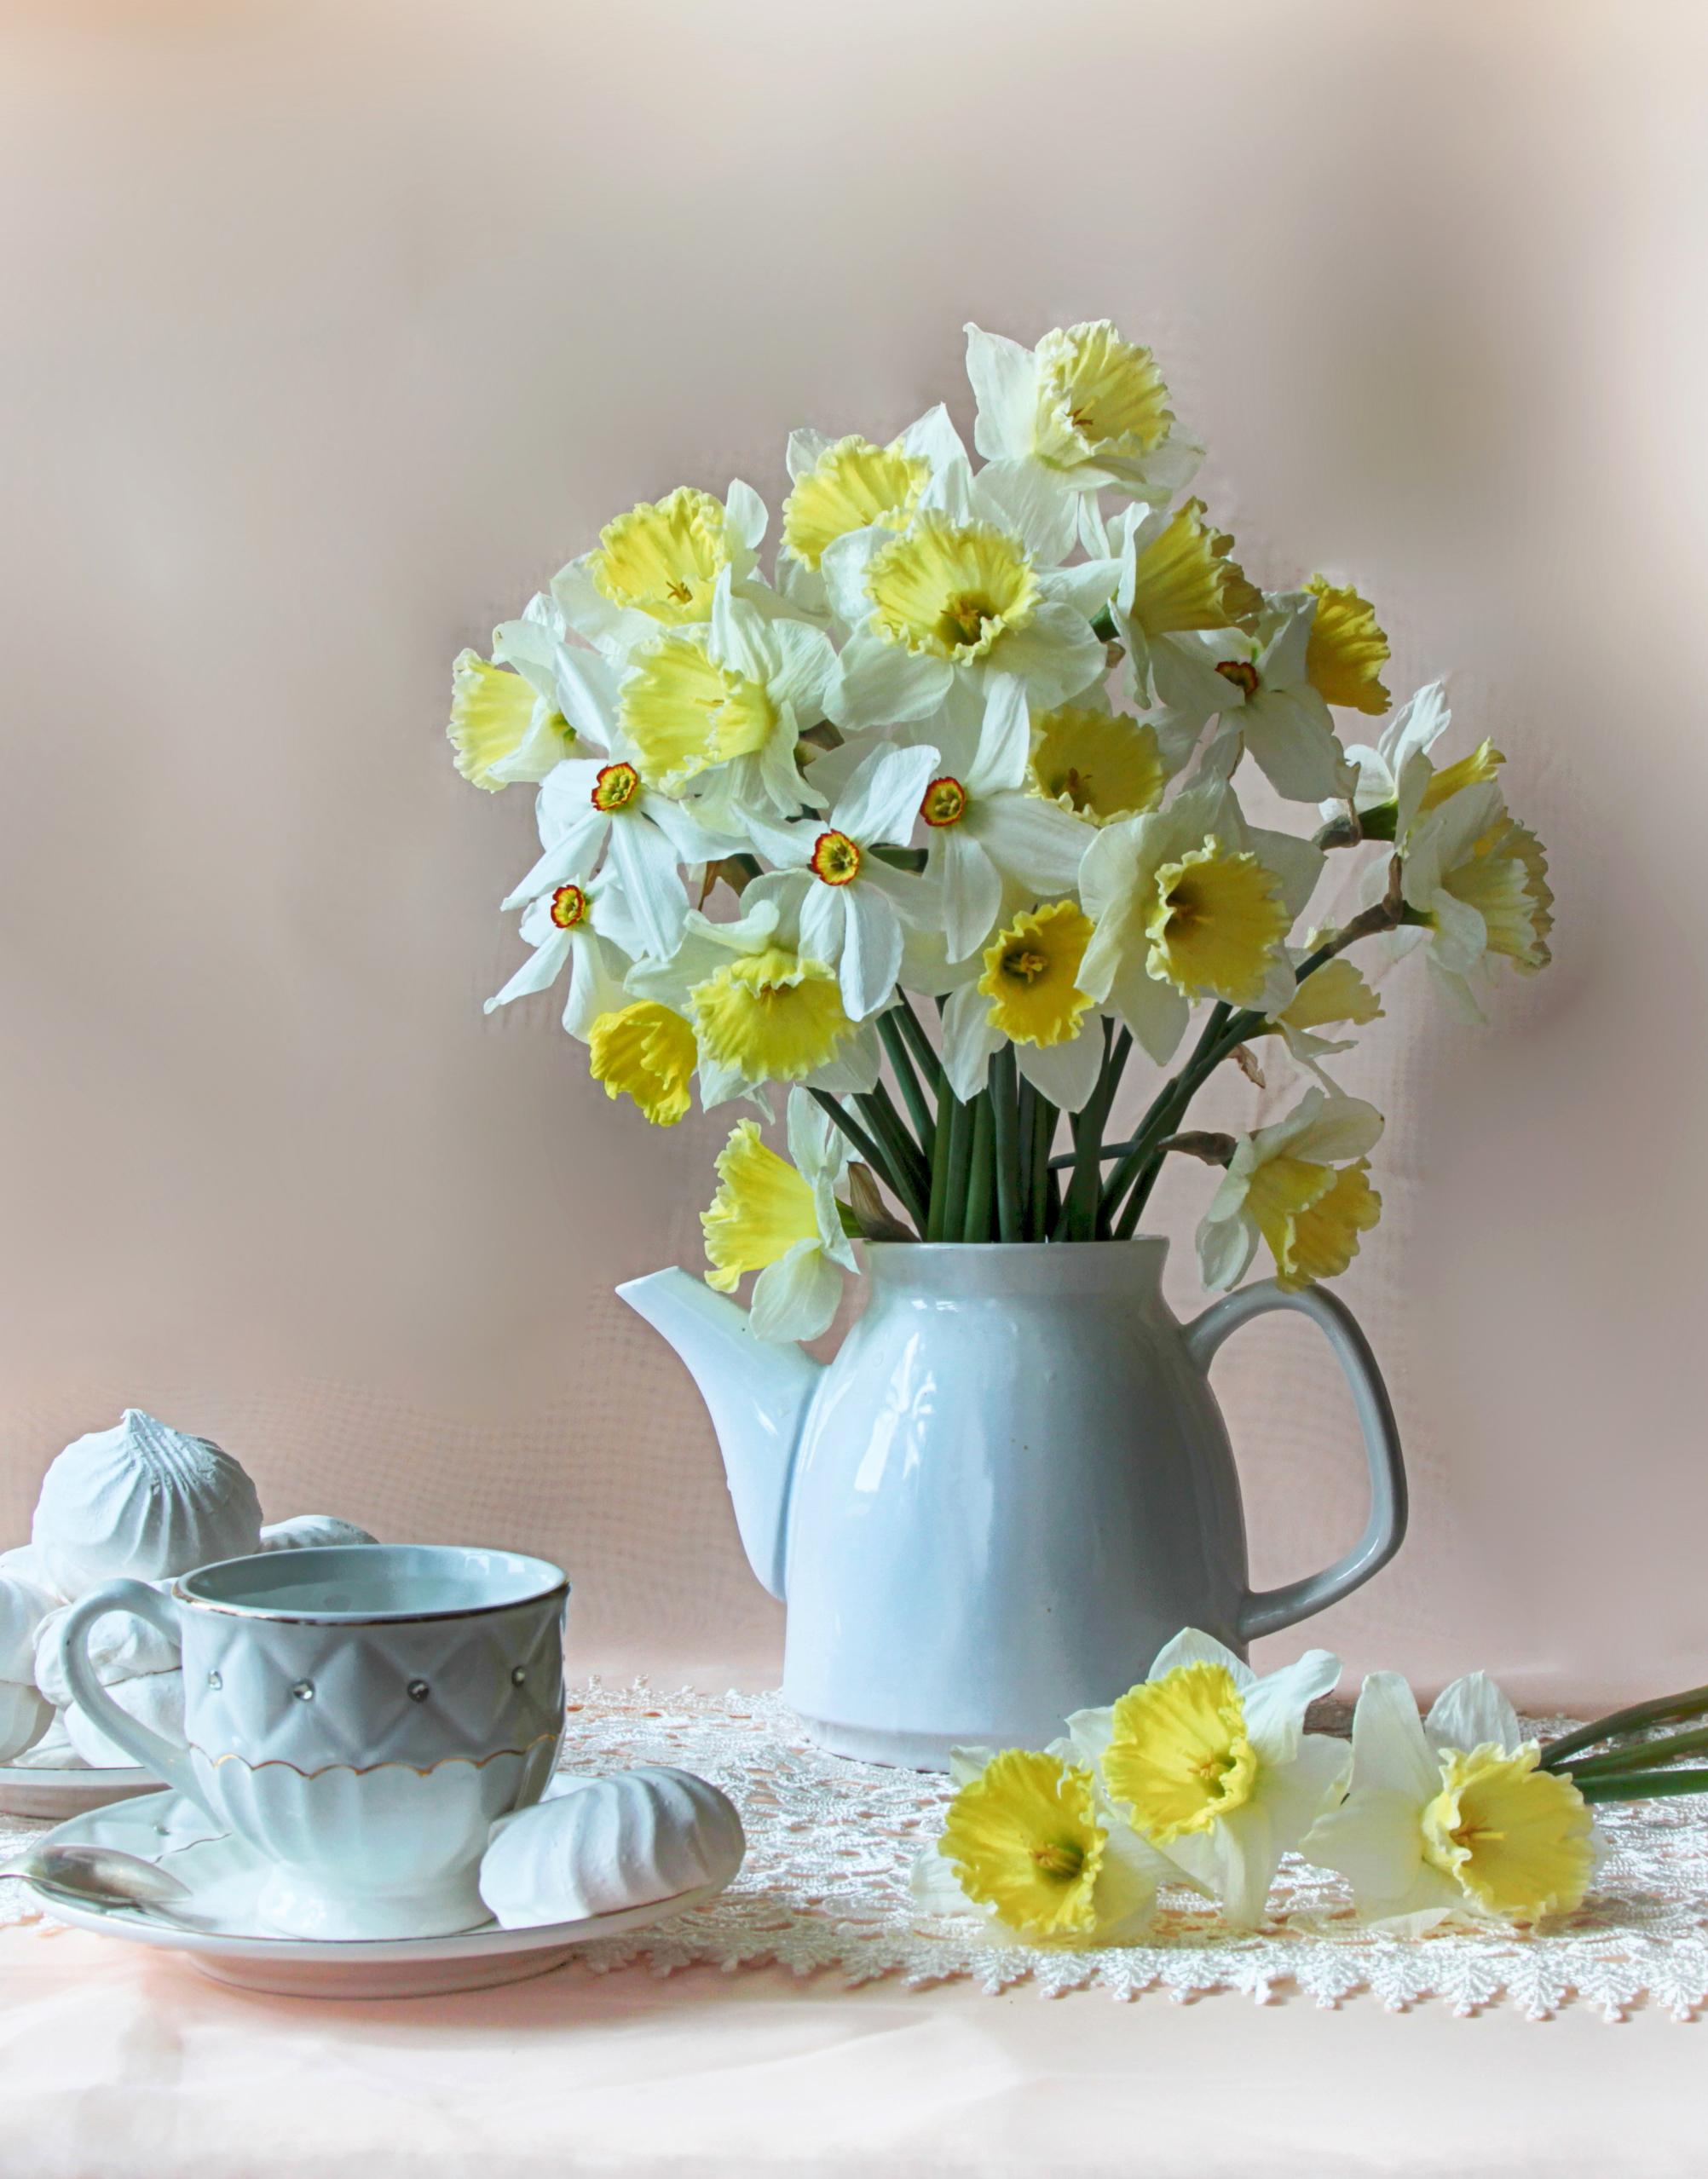 daffodils-photo-99